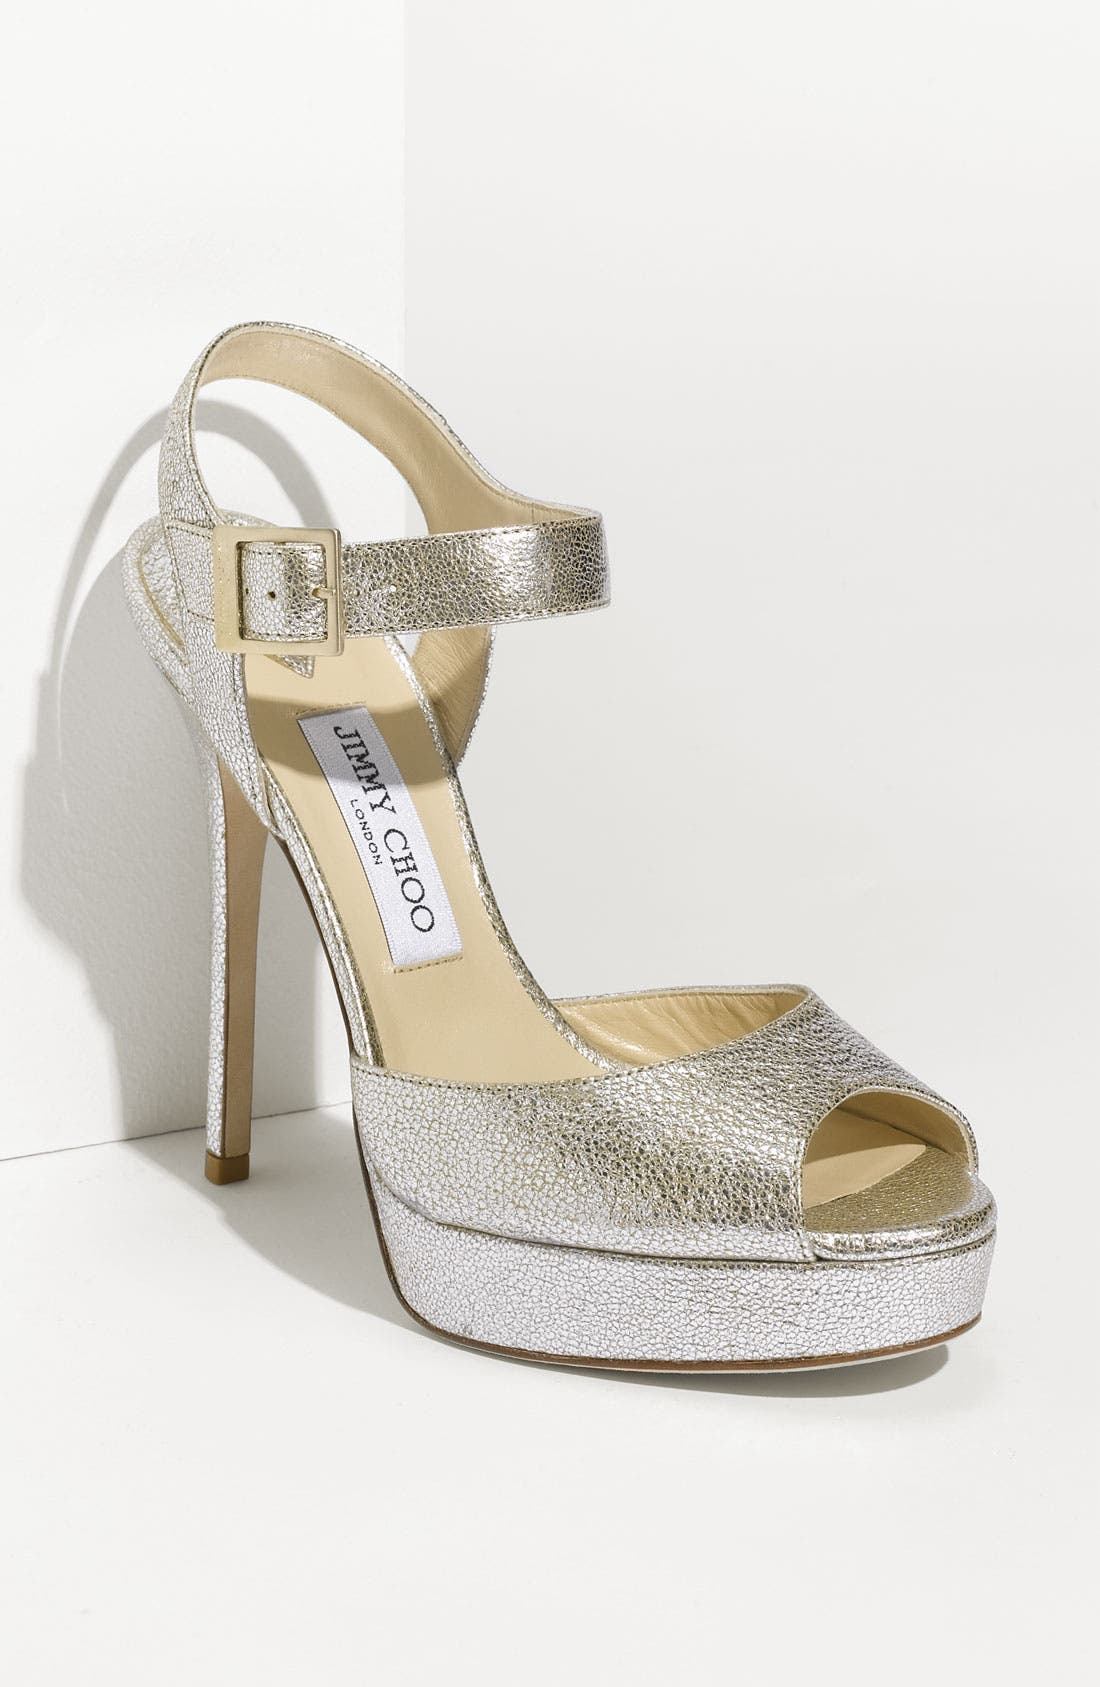 Alternate Image 1 Selected - Jimmy Choo 'Linda' Sandal (Exclusive Color)